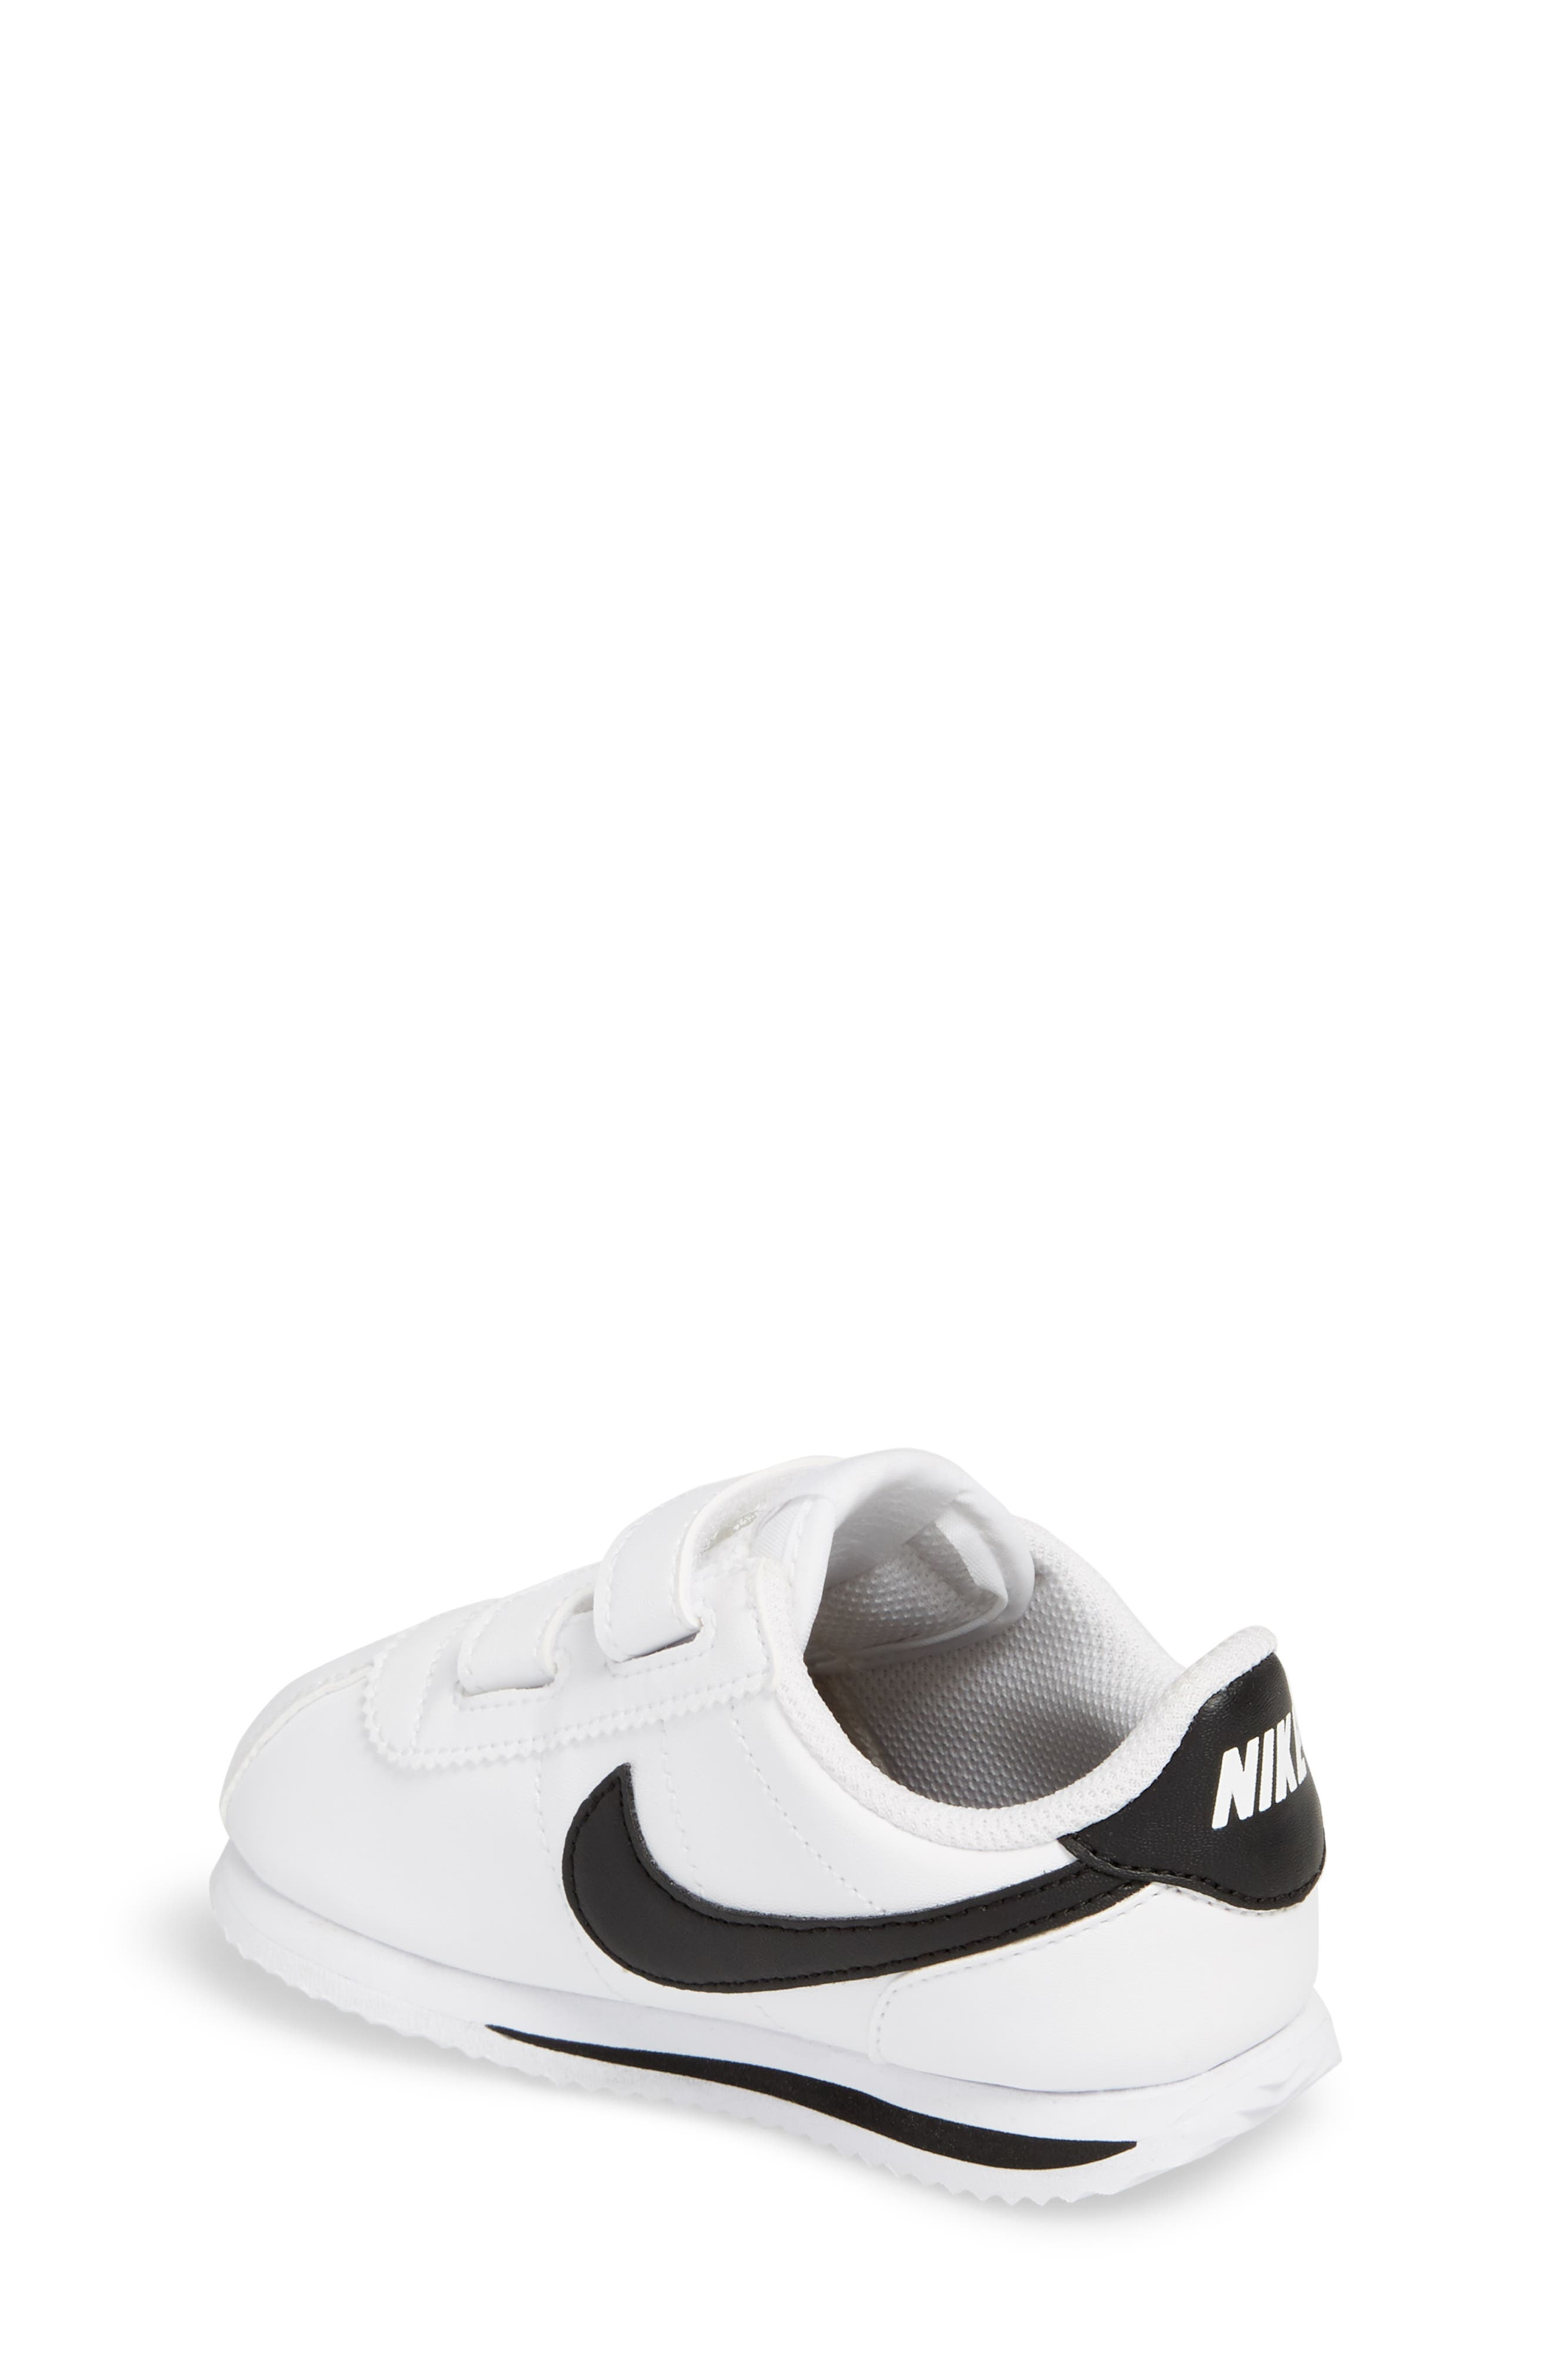 Cortez Basic SL Sneaker,                             Alternate thumbnail 2, color,                             White/ Black